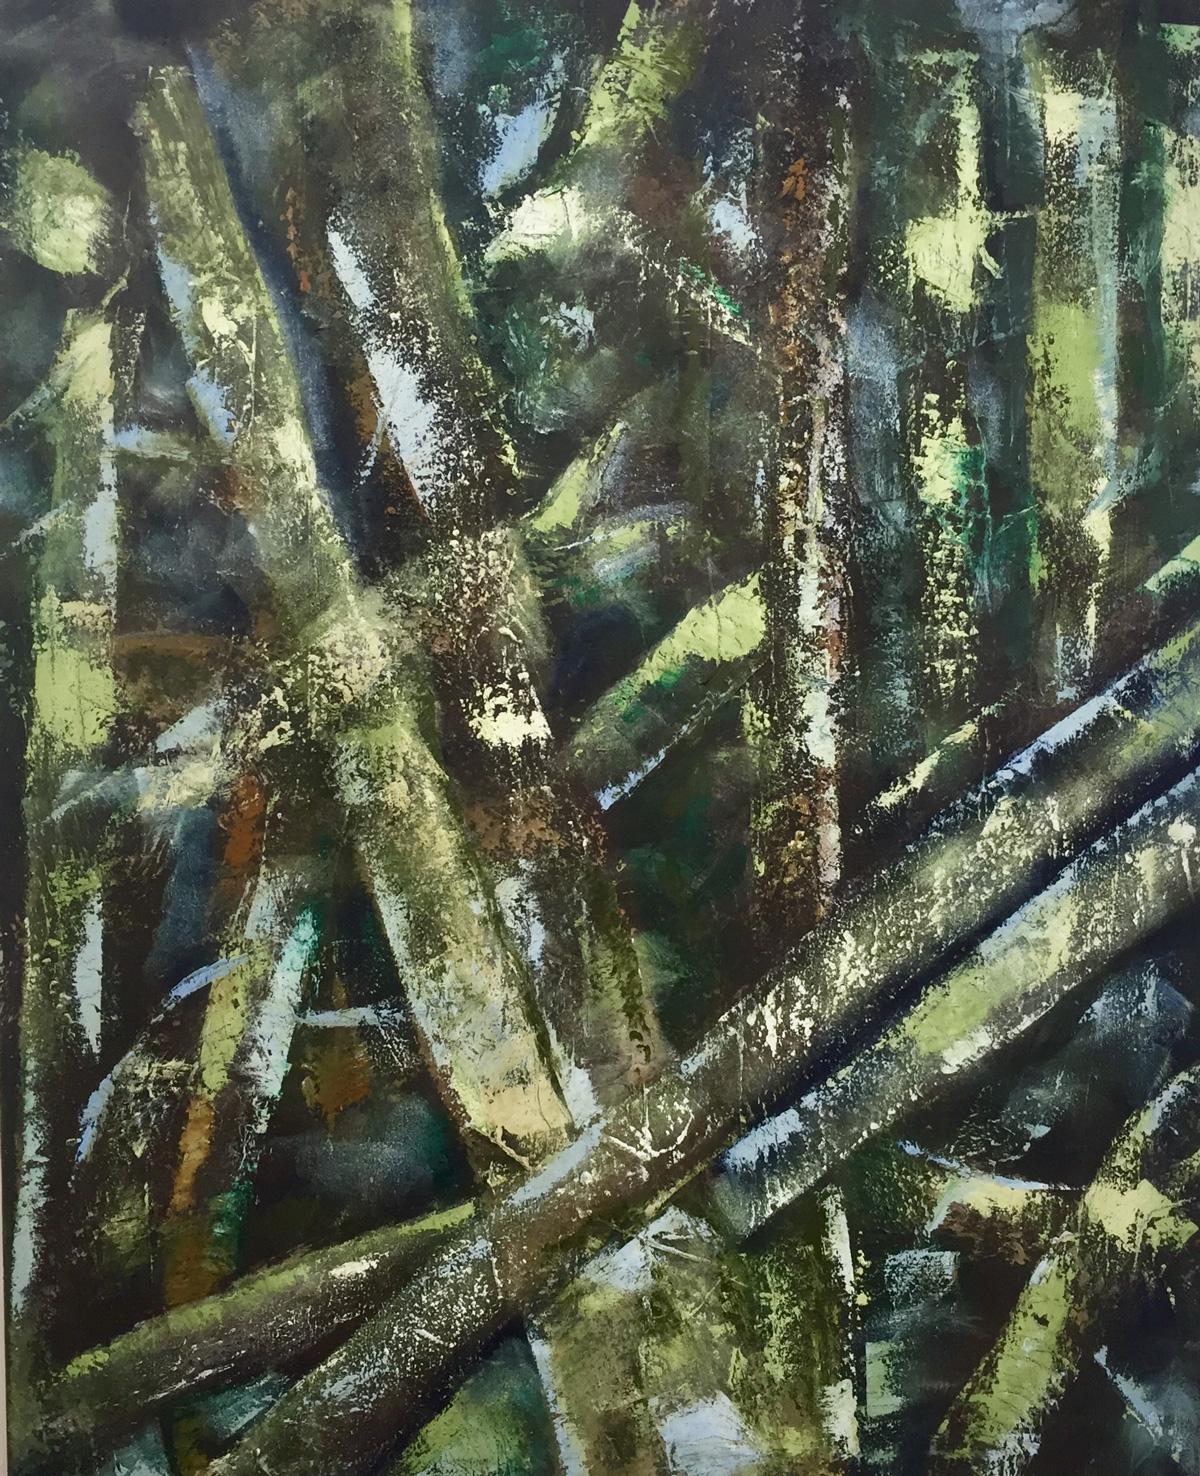 Unterholz / Undergrowth